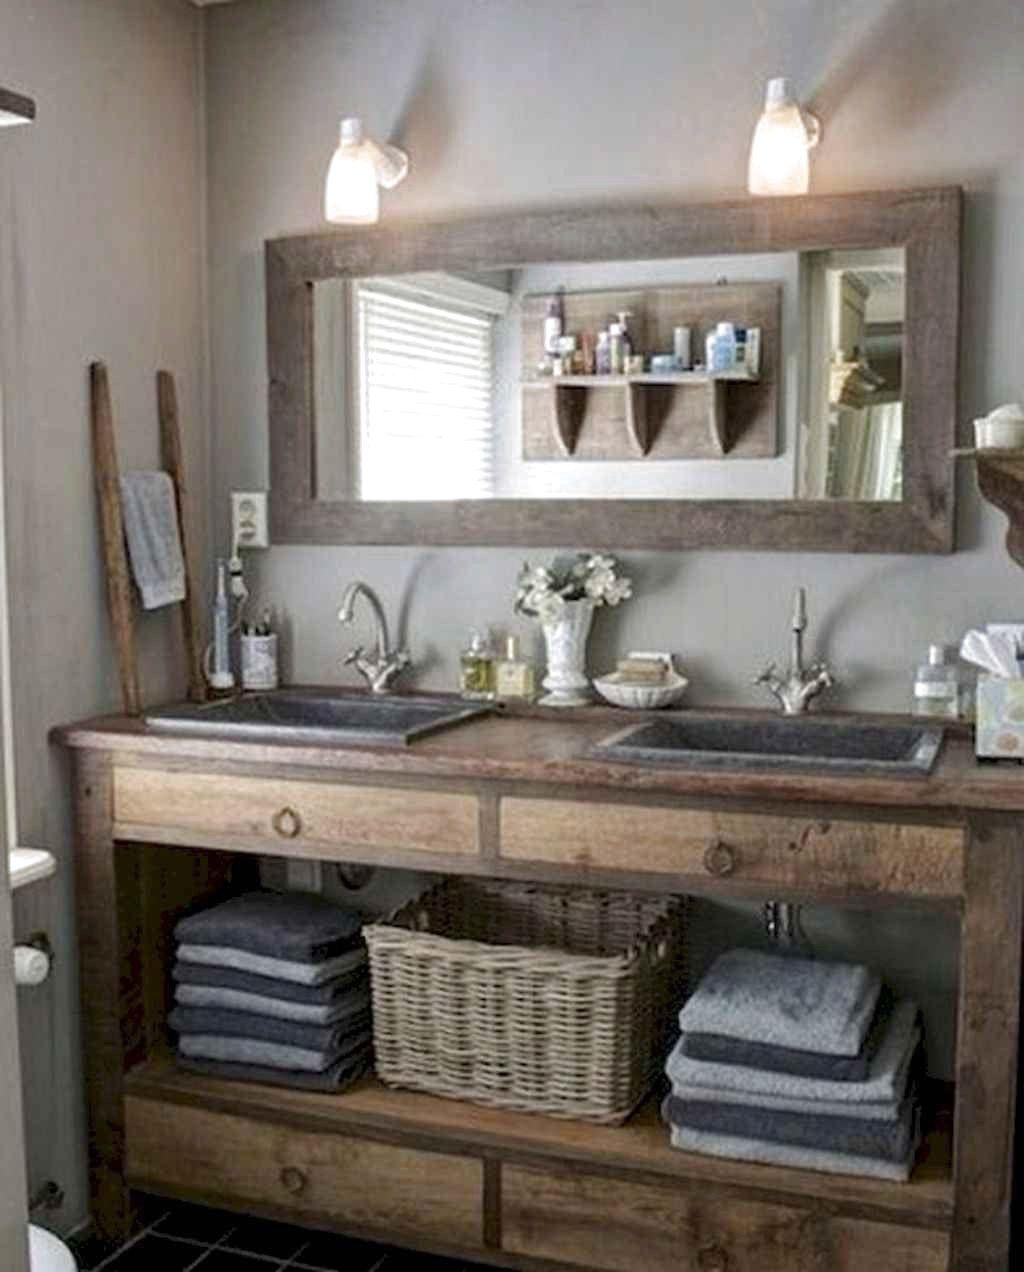 Just Another Wordpress Site Bathrooms Remodel Small Space Bathroom Remodel Bathroom Vanity Decor